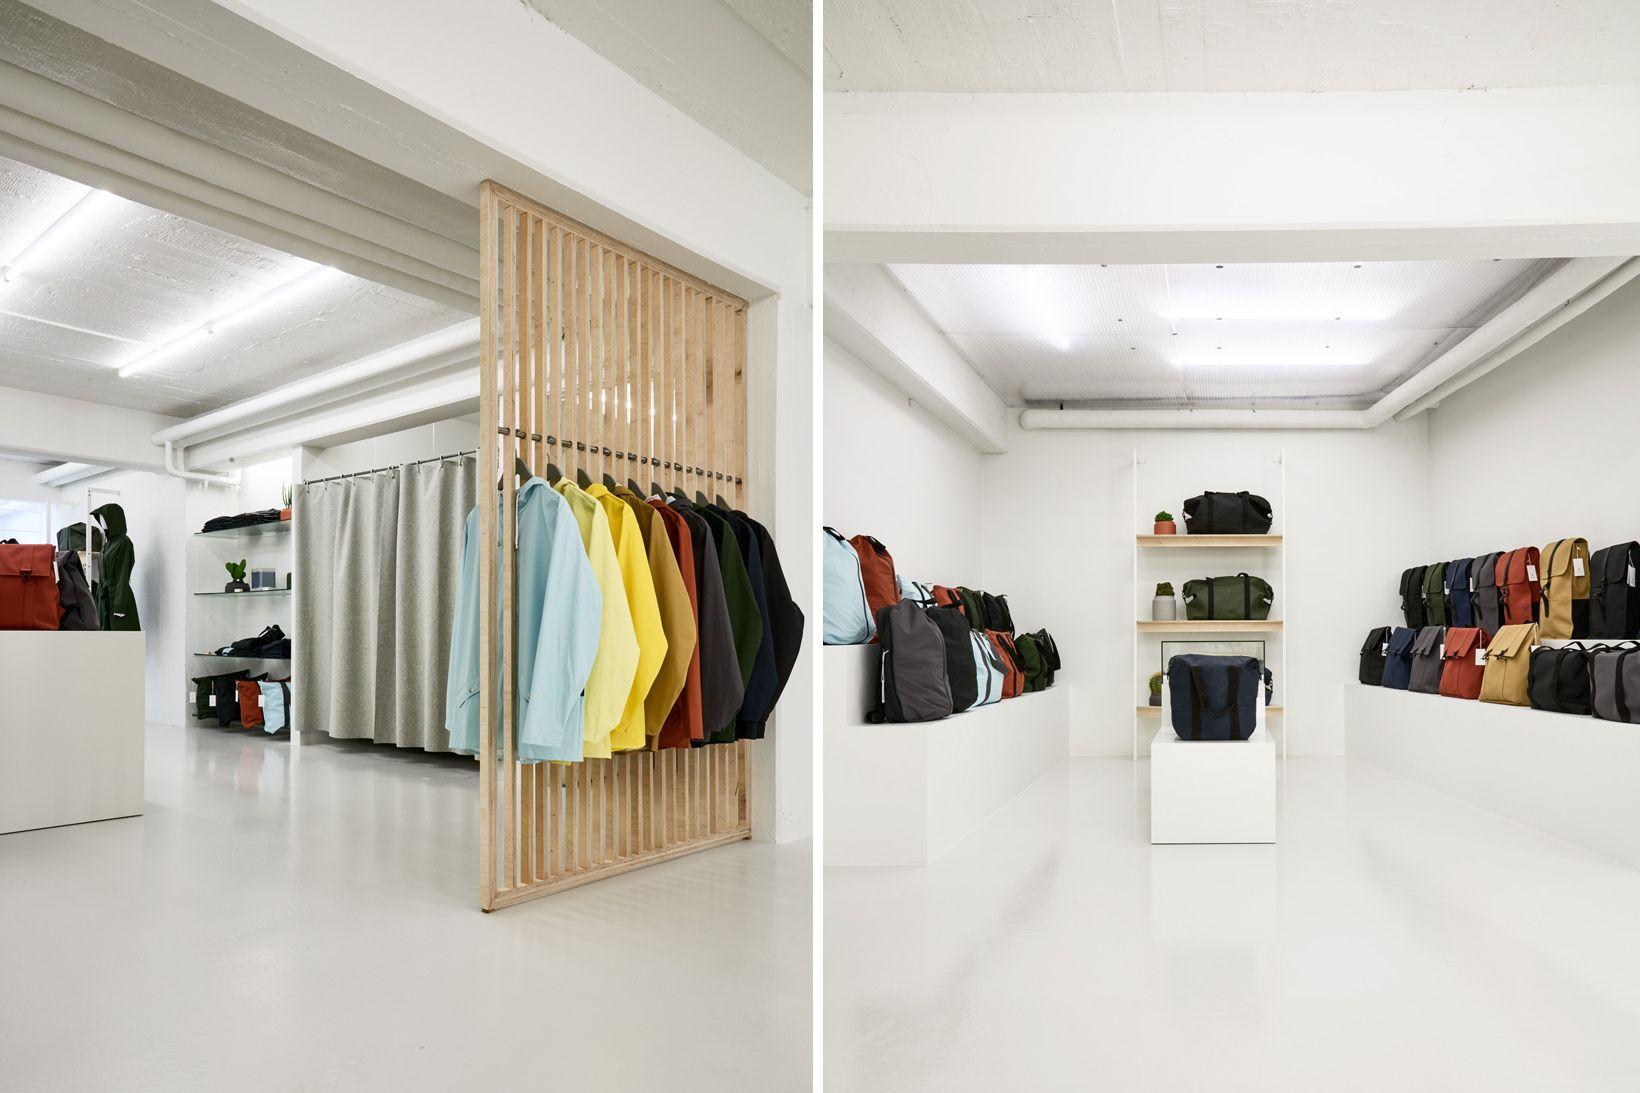 Rains Concept Store In Aarhus, Denmark Exemplifies Its Ultra Clean Aesthetic